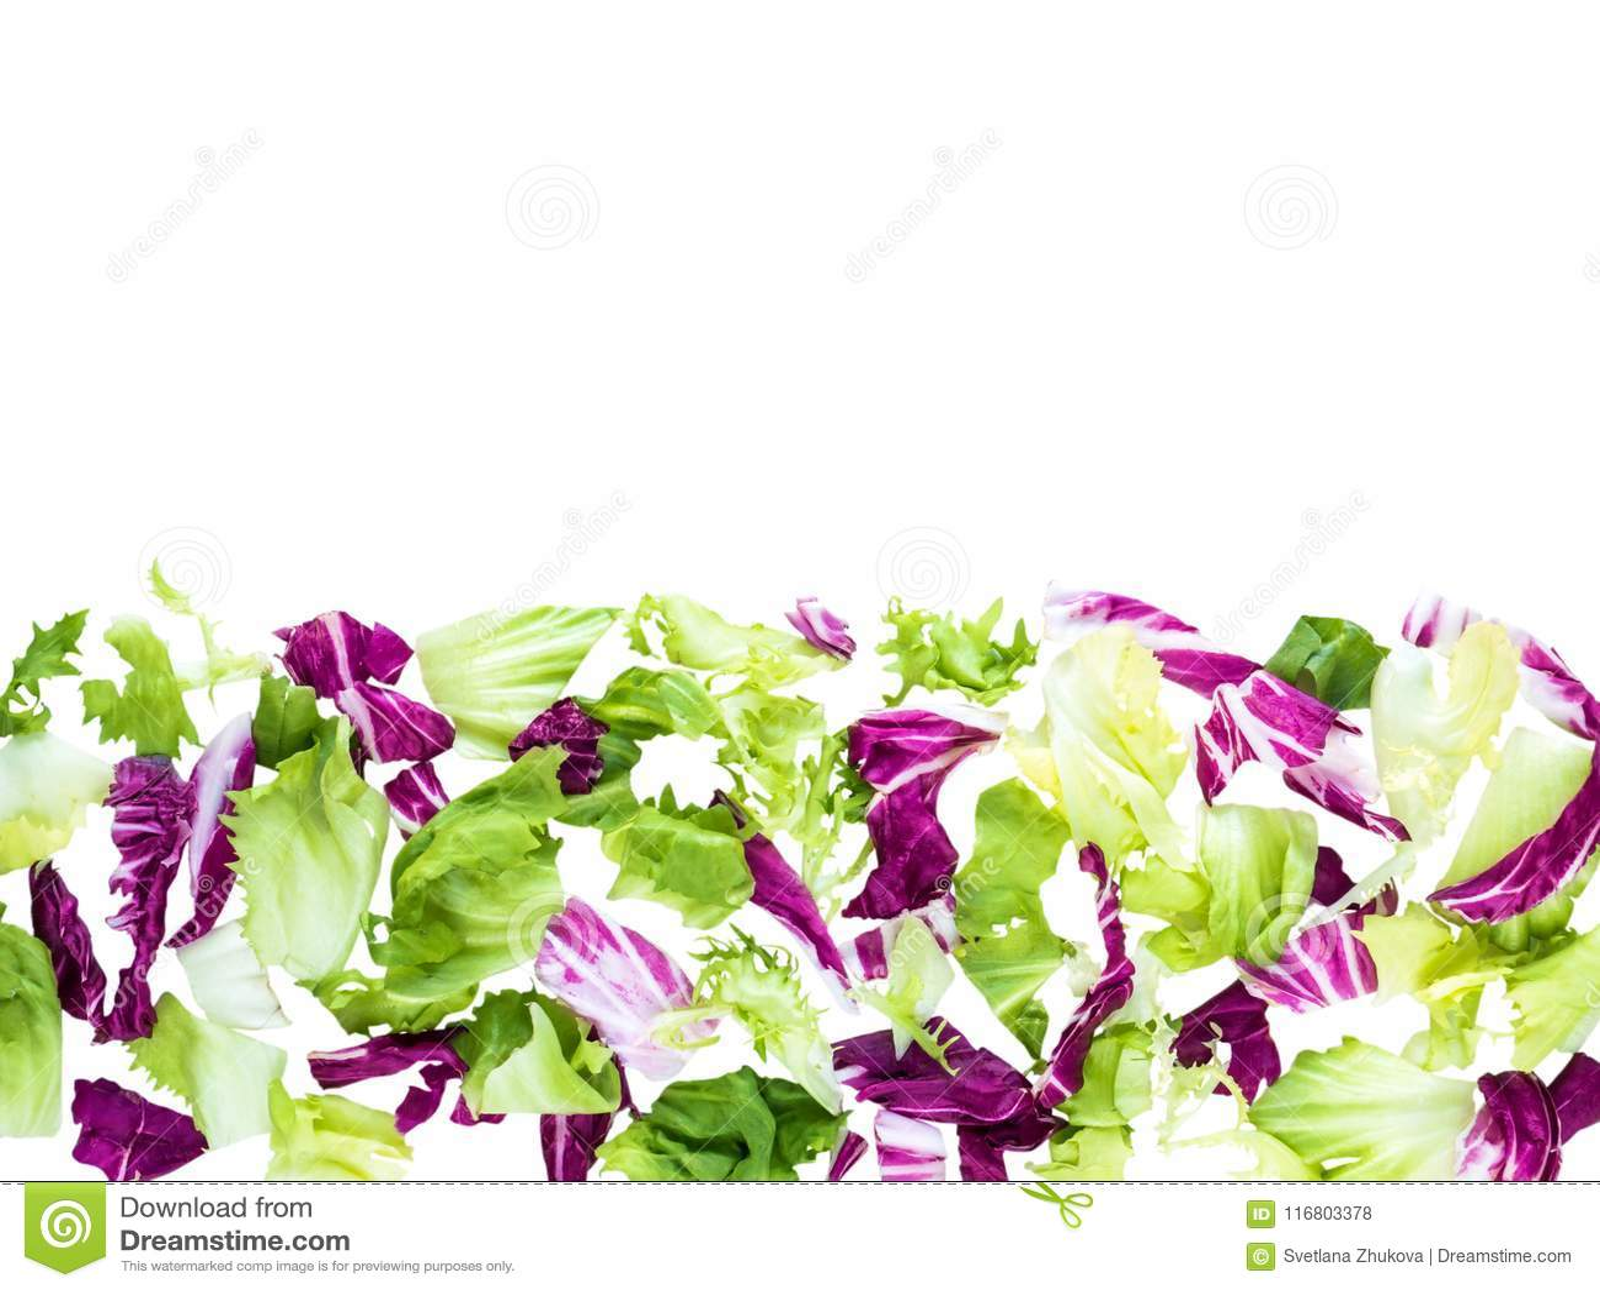 Horizontal border of mixed salad leaves top view